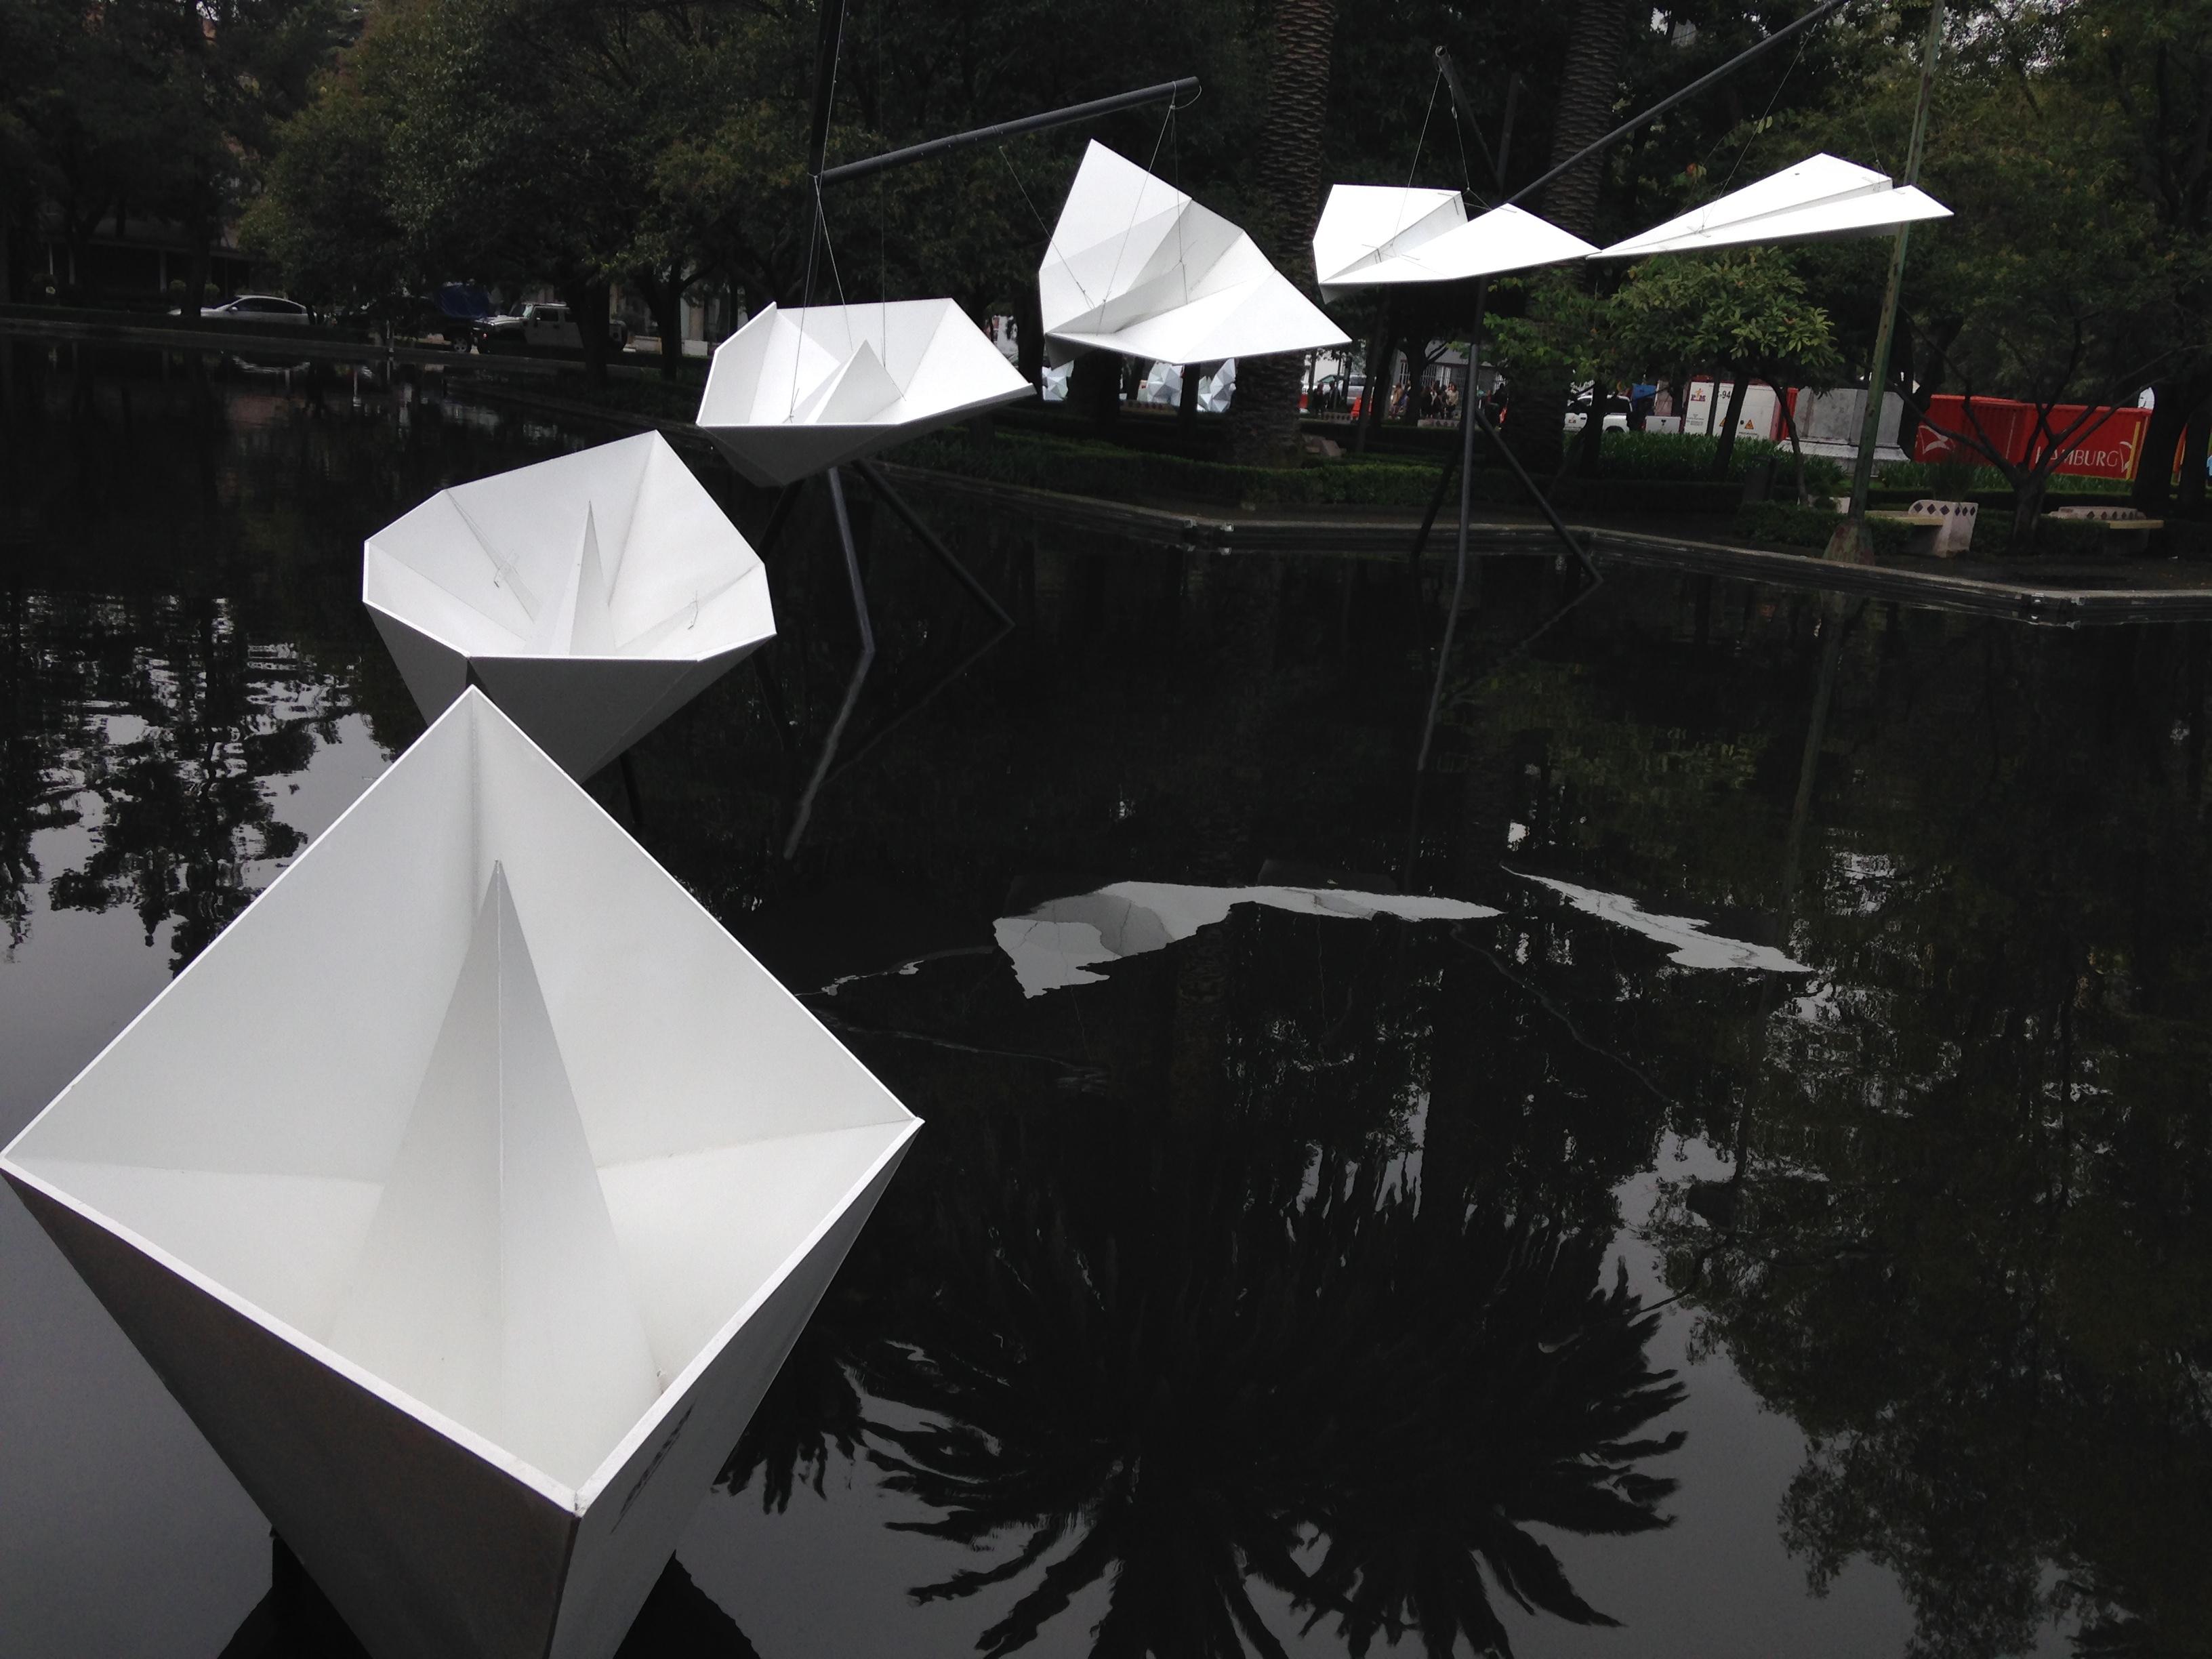 Estructuras Efímeras en Design Week México (2015). Imagen tomada de inreallifeirl.wordpress.com/